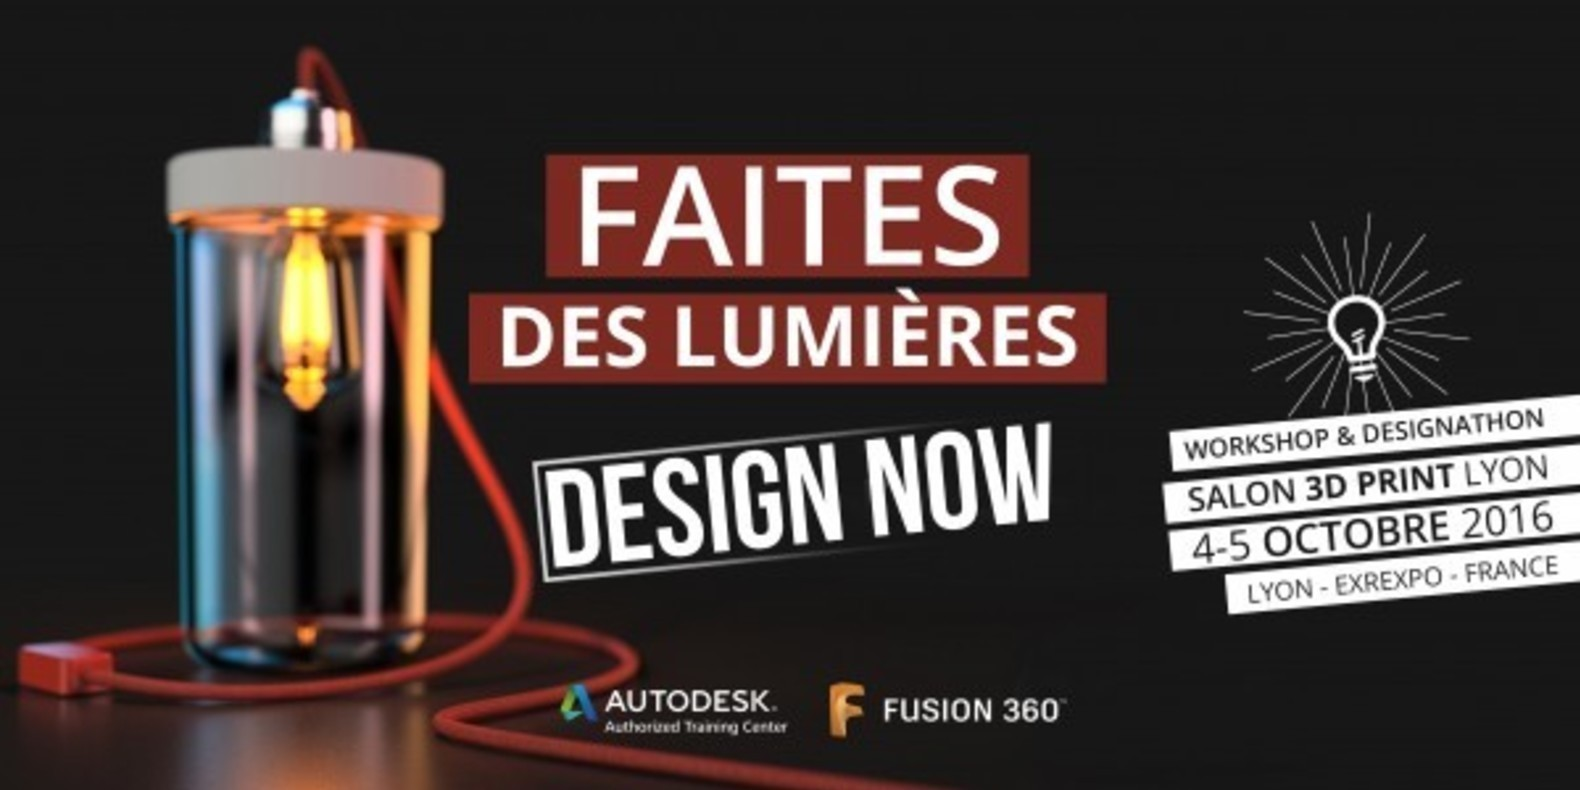 http://fichier3d.fr/wp-content/uploads/2016/09/Designnow-Web.jpg